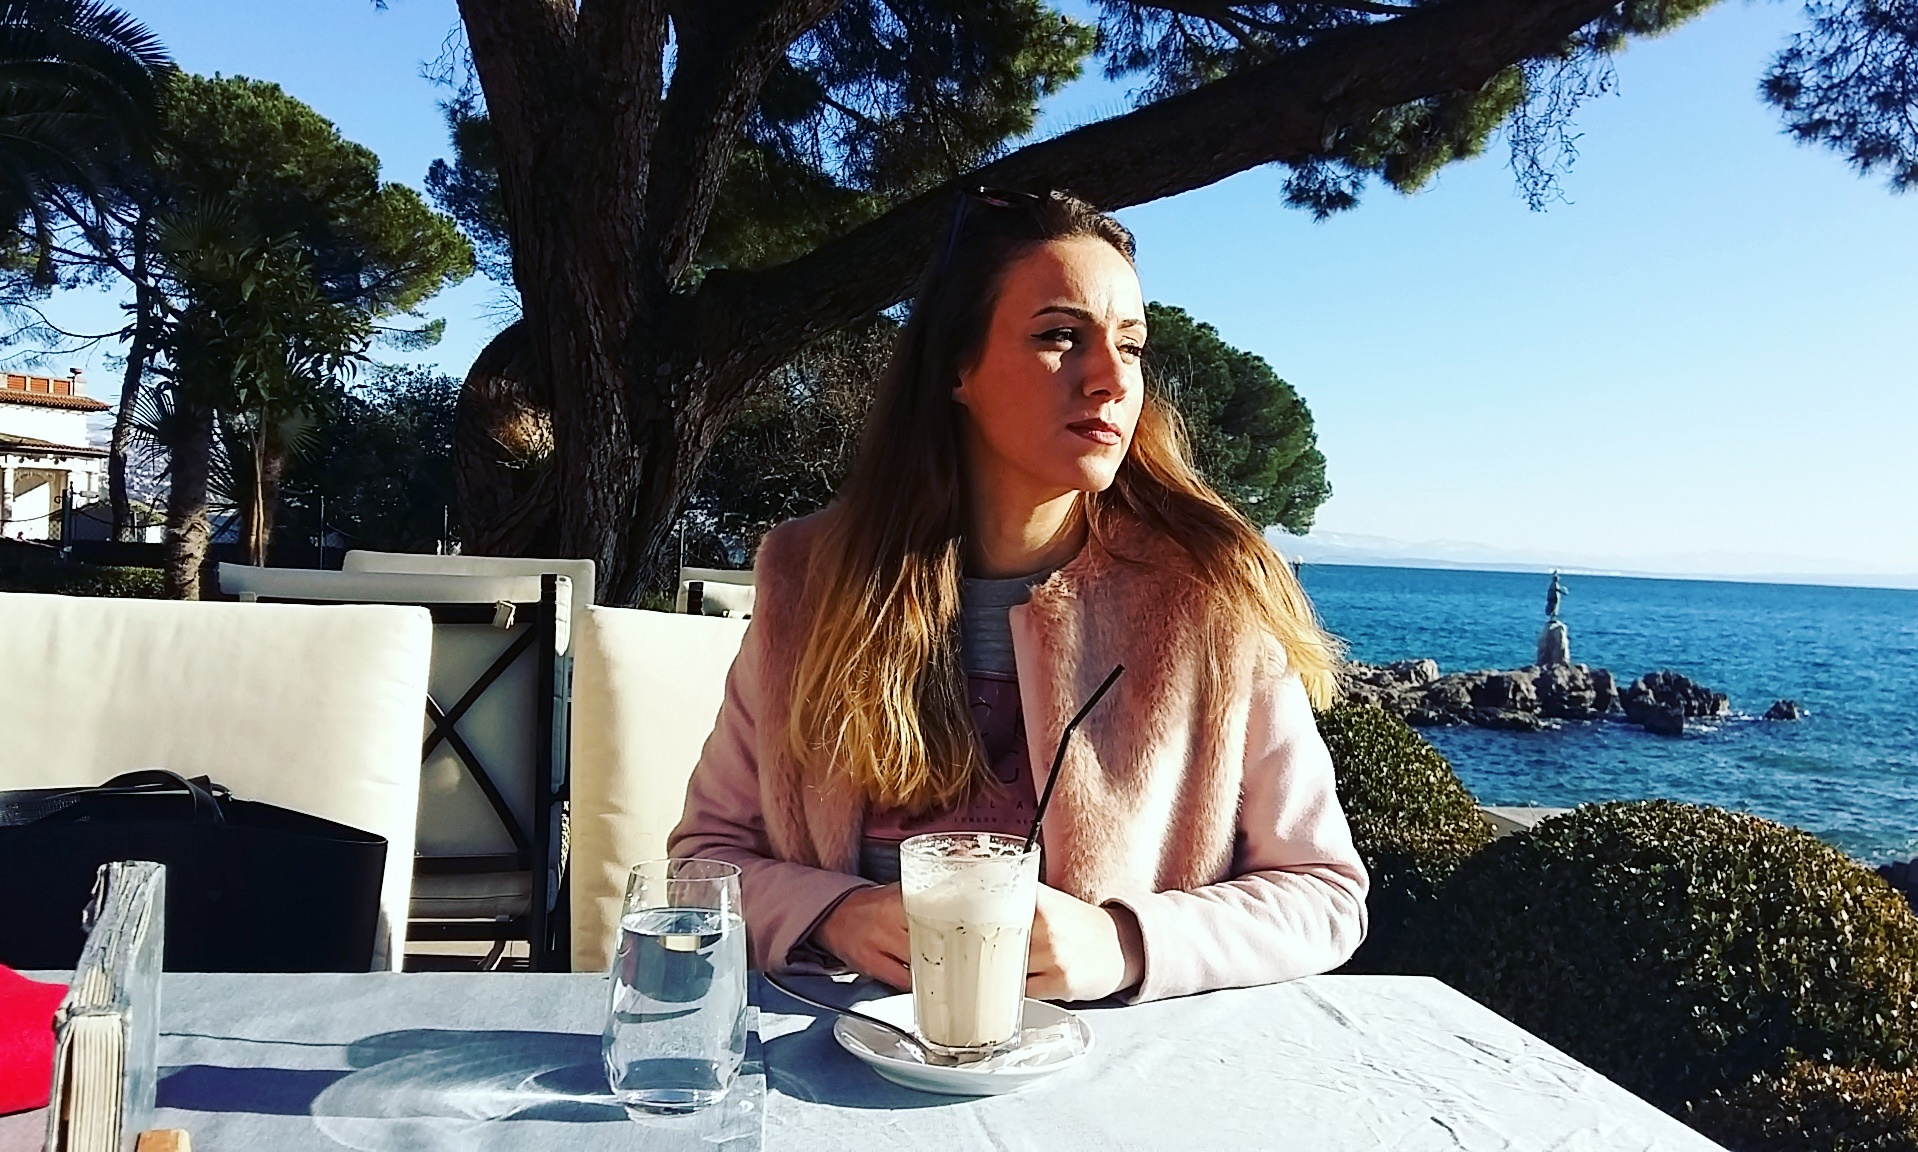 Tara Đukić: U svoj san uloži sebe celog!